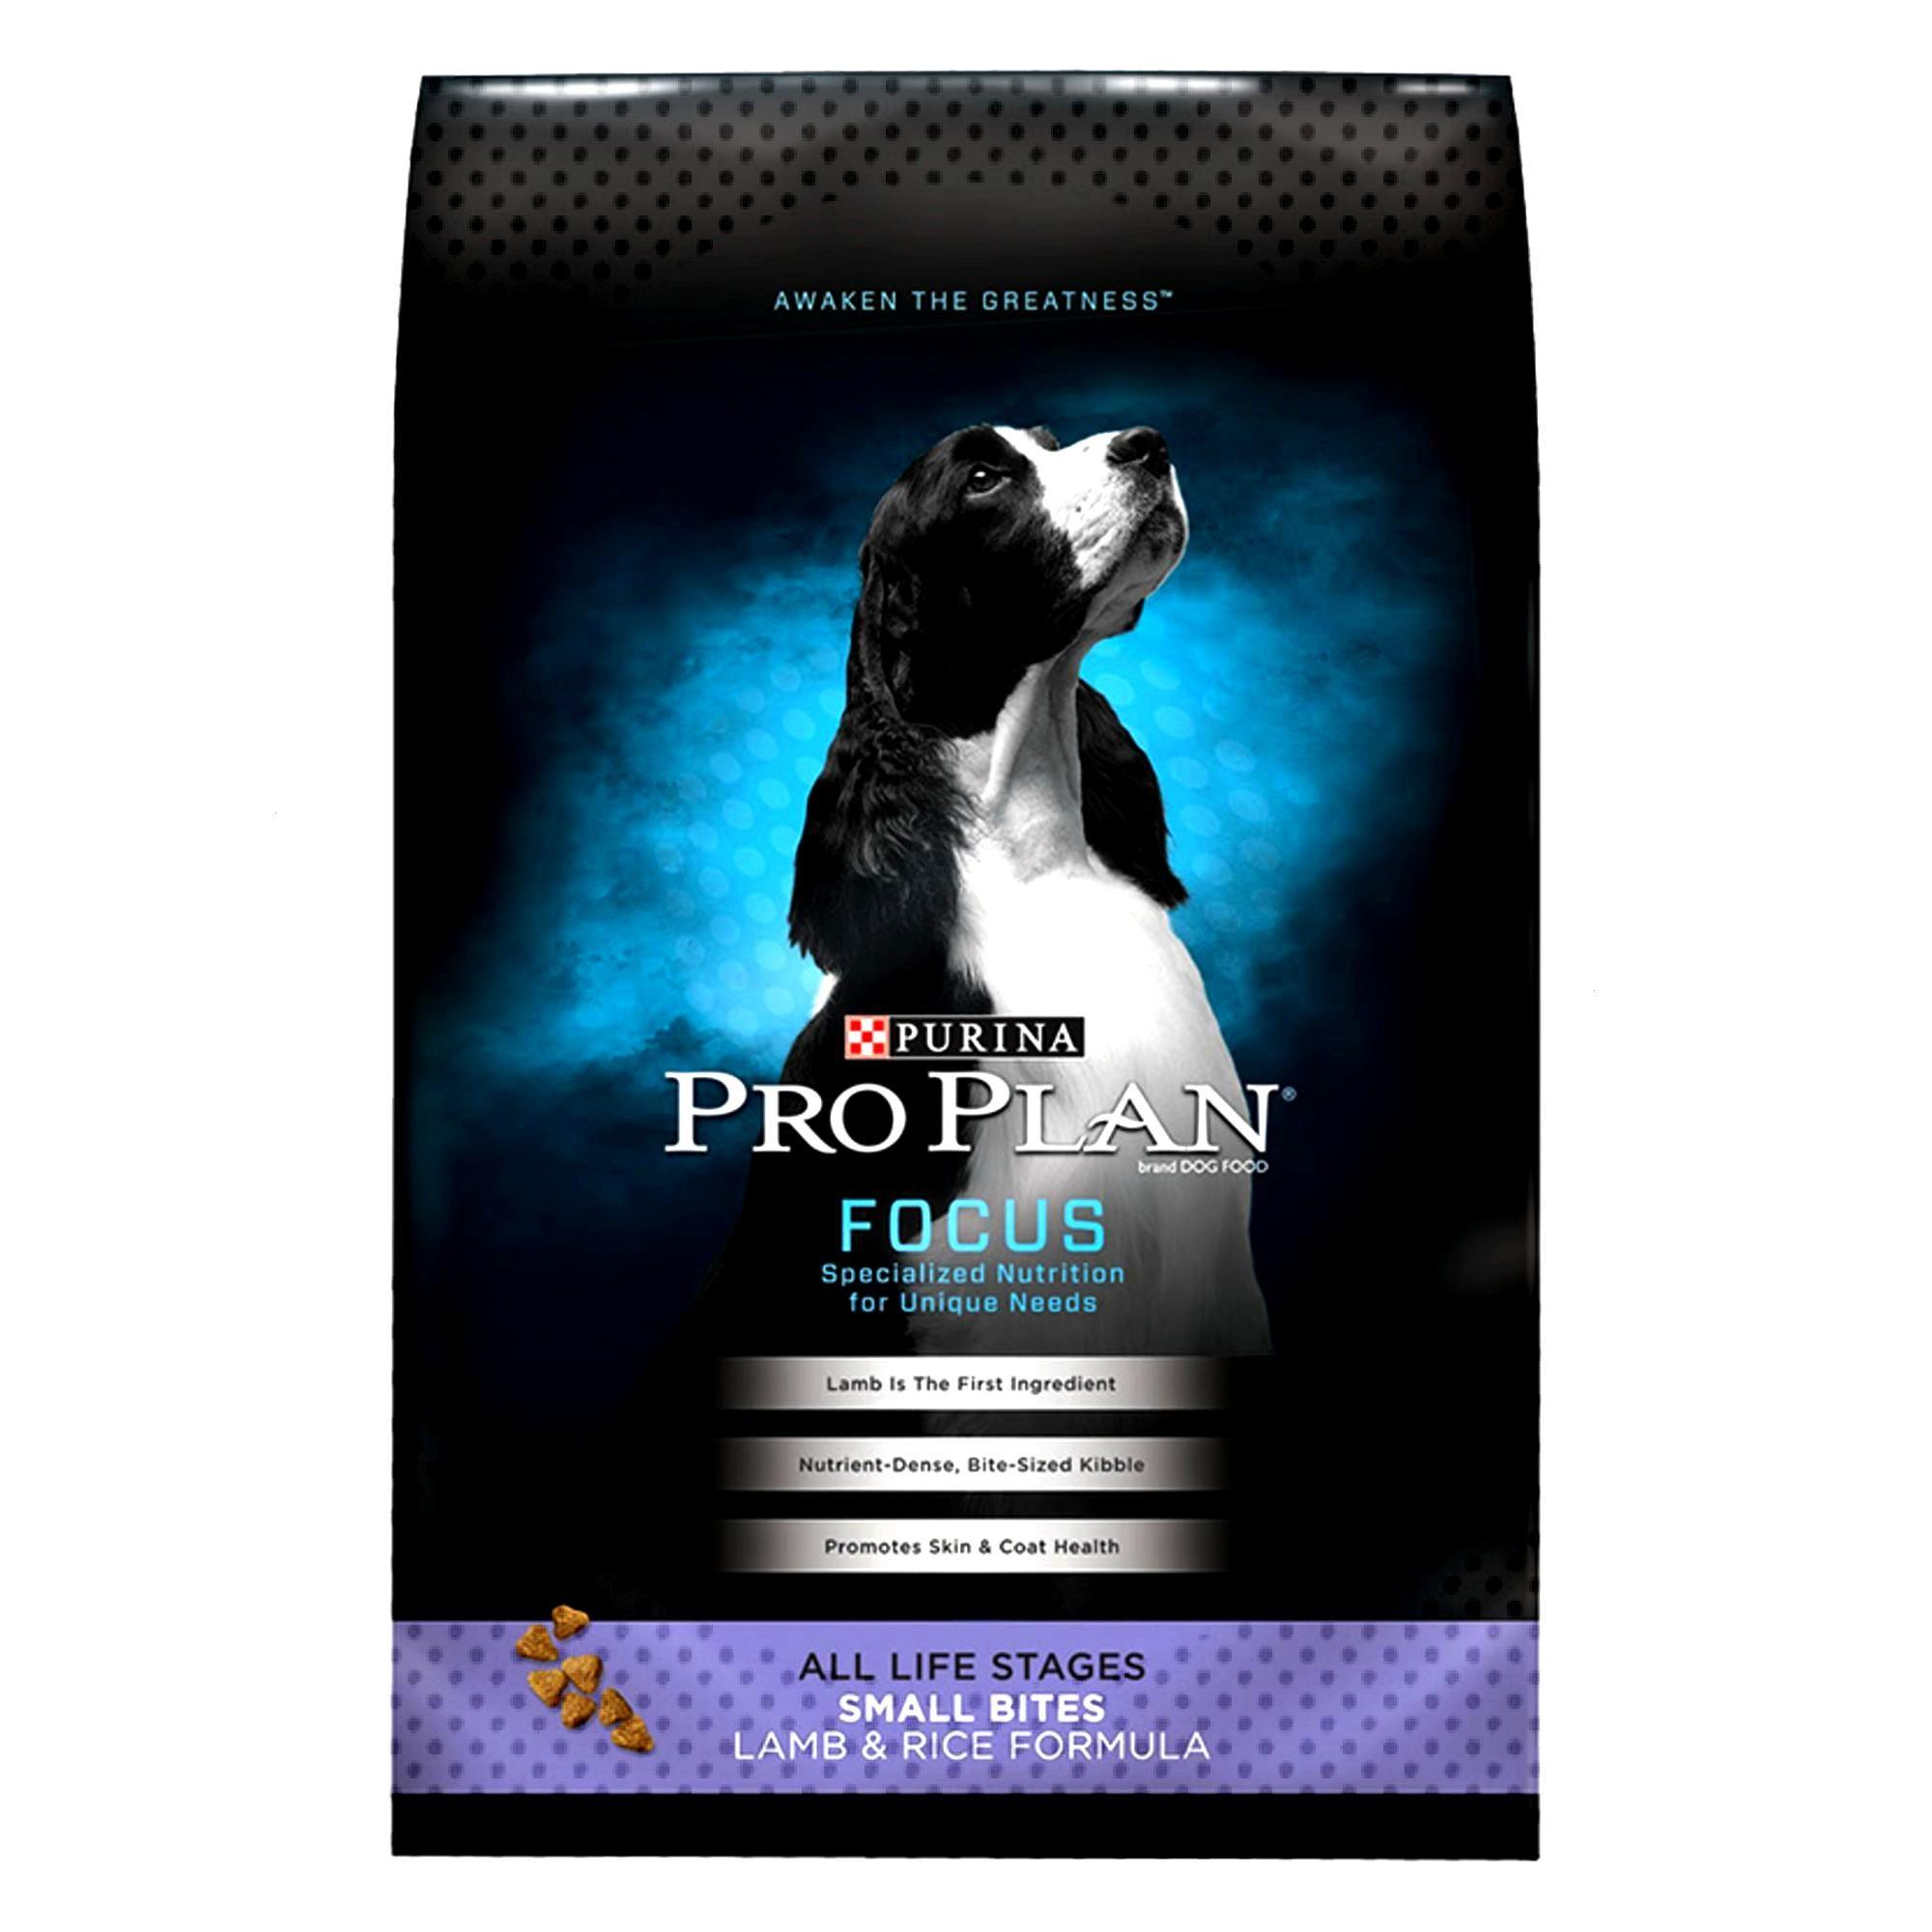 Purina Pro Plan Small Bites Dog Food size: 18 Lb, Lamb & Rice